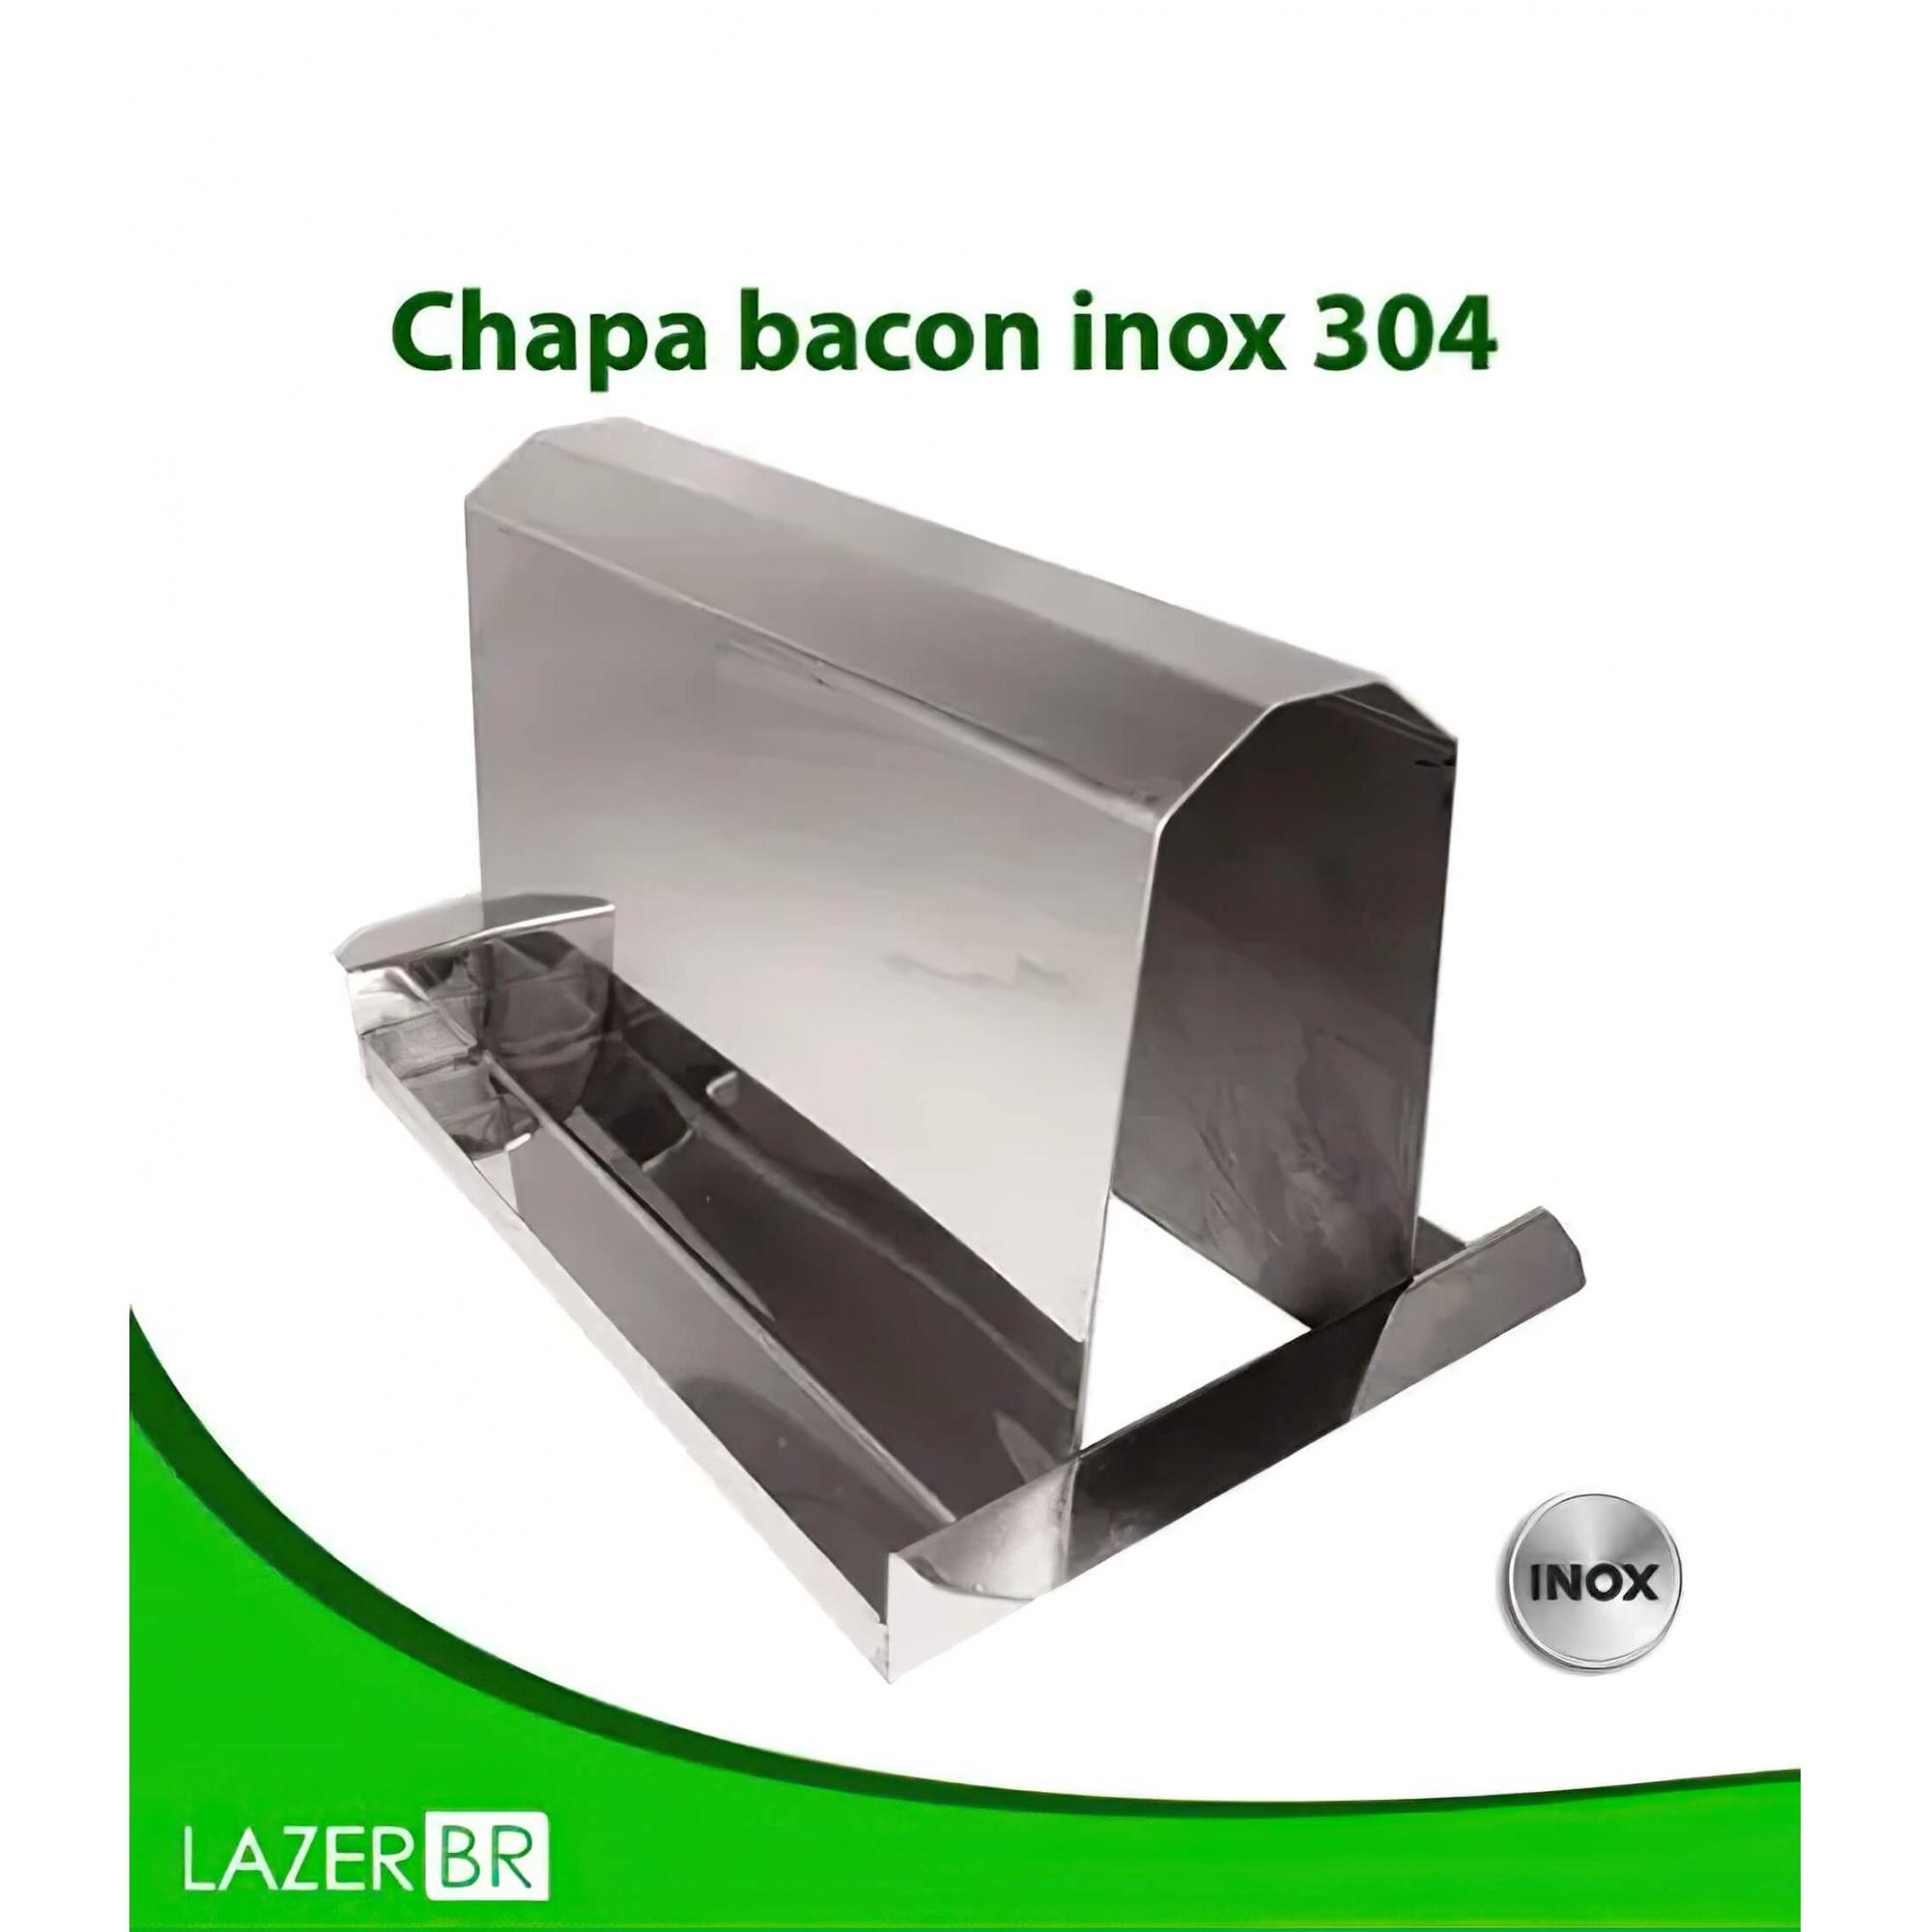 Chapa Bacon Grill inox 304